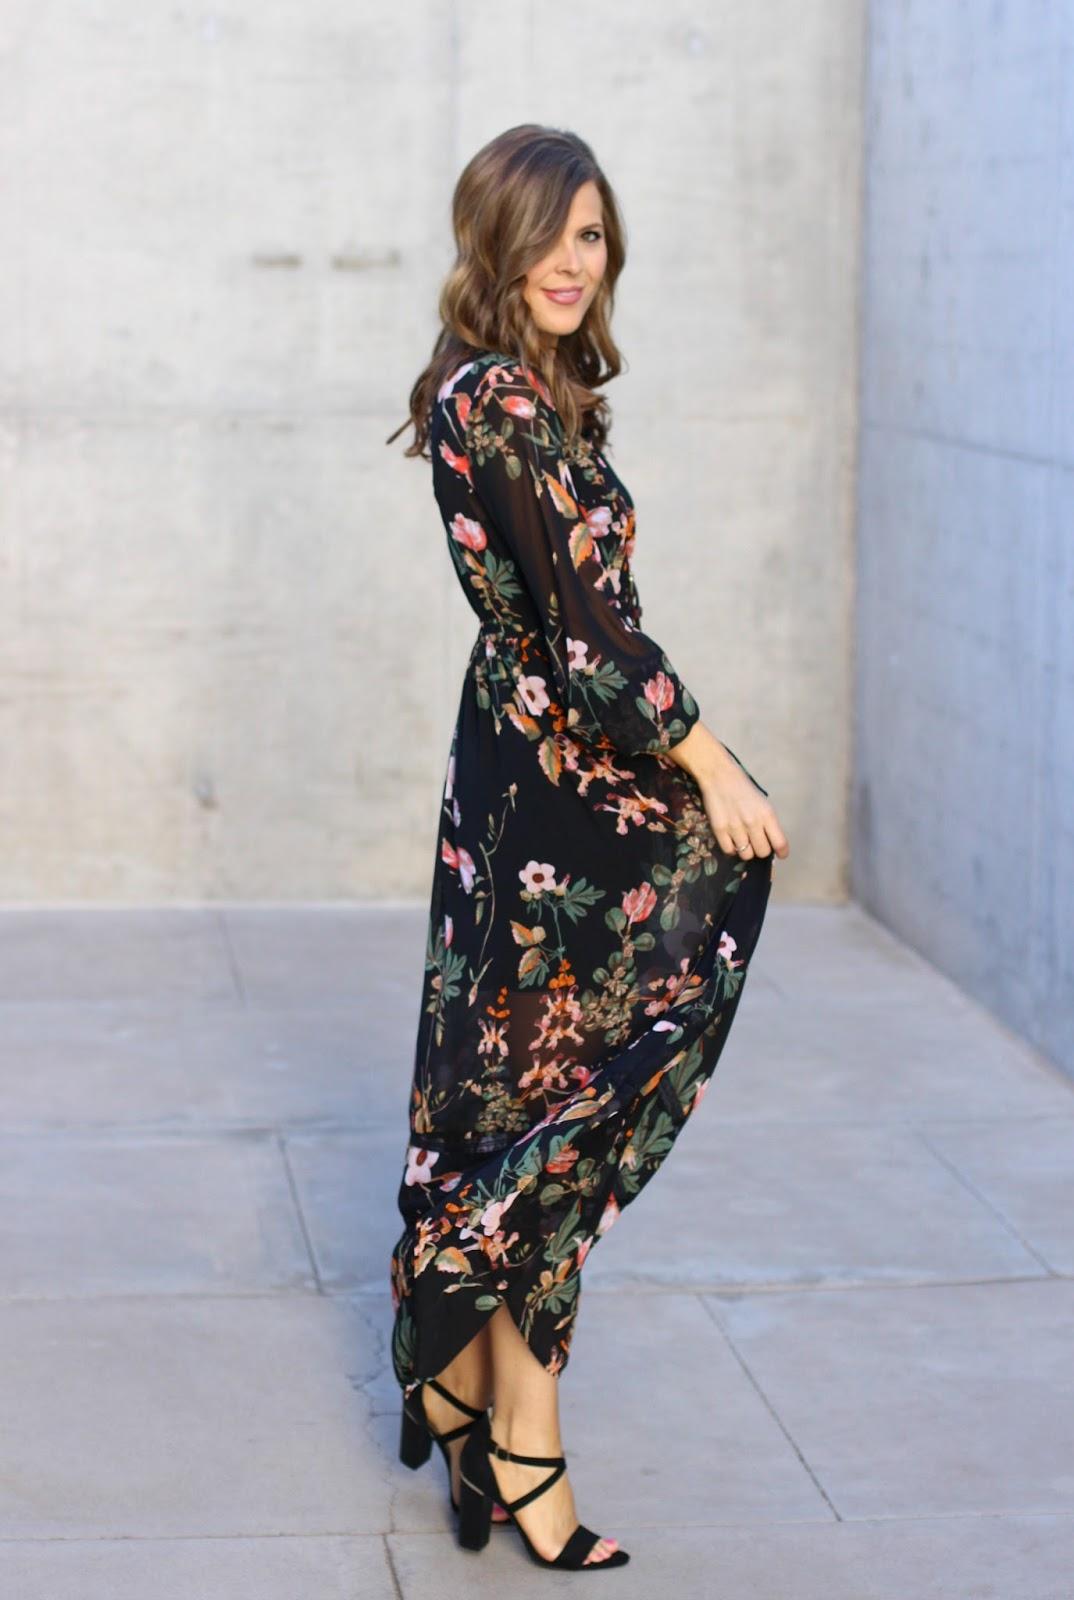 BELLE SKY Floral Maxi Dress